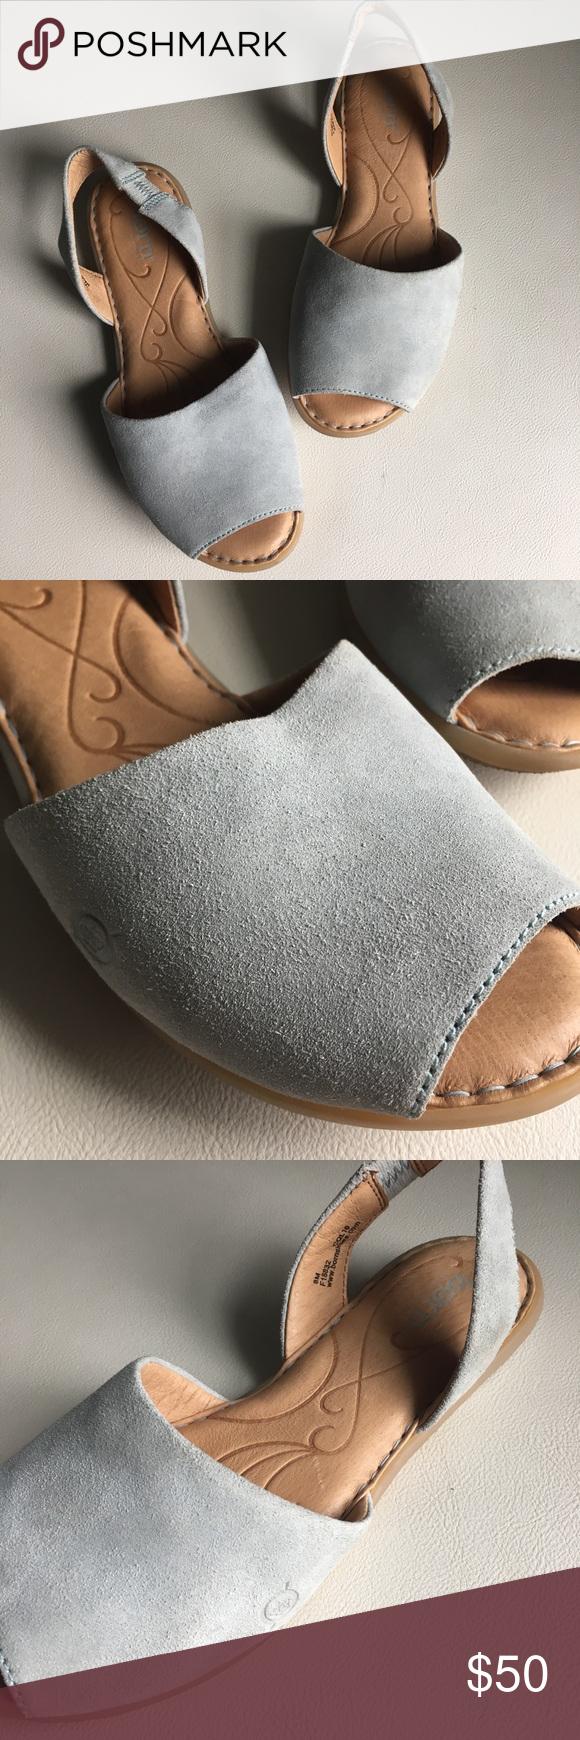 Peep toe sandals, Genuine suede